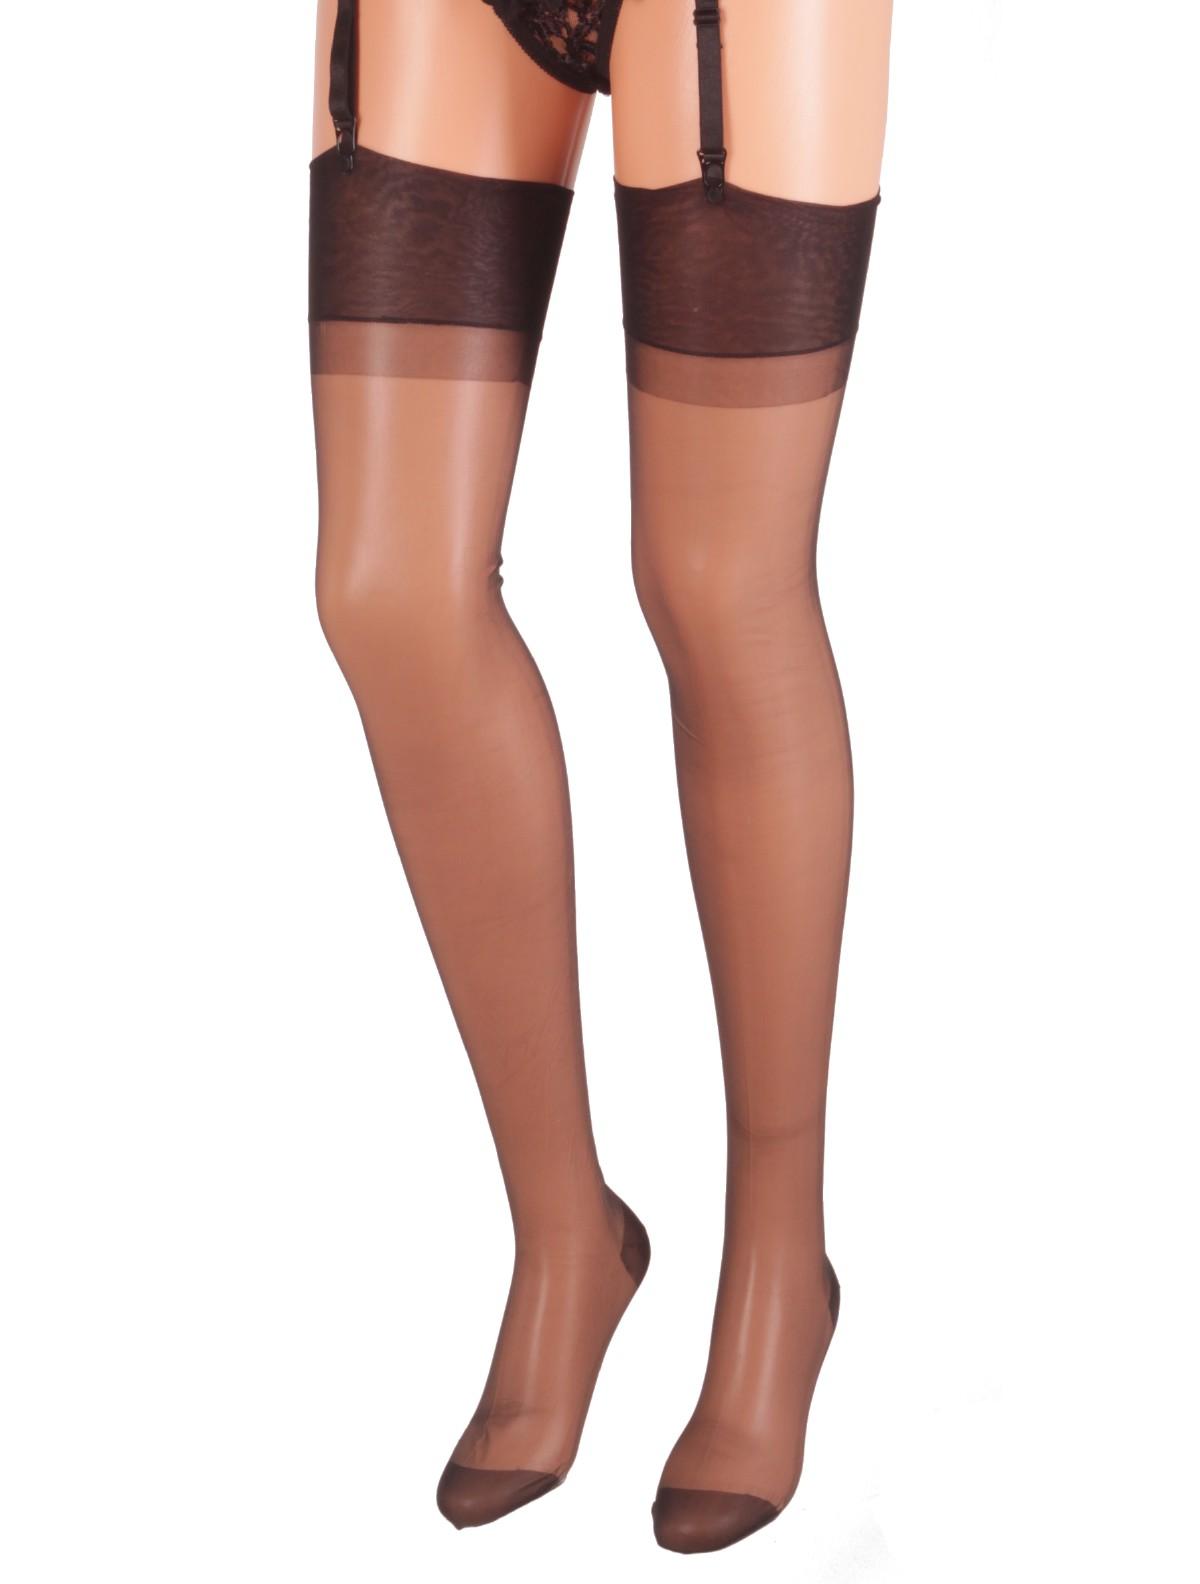 Cervin stockings